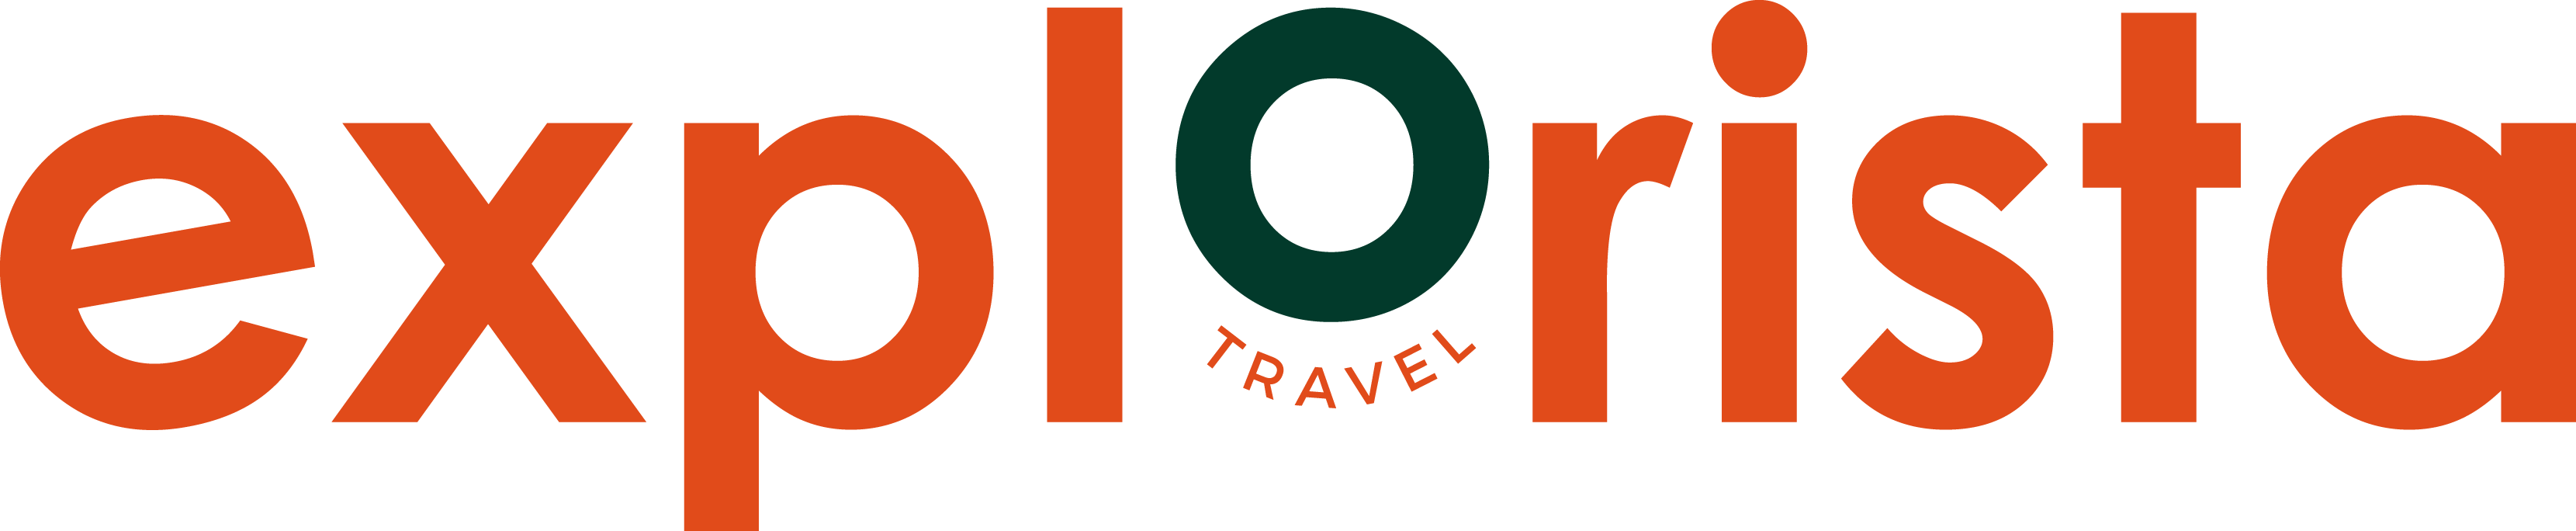 explorista travel